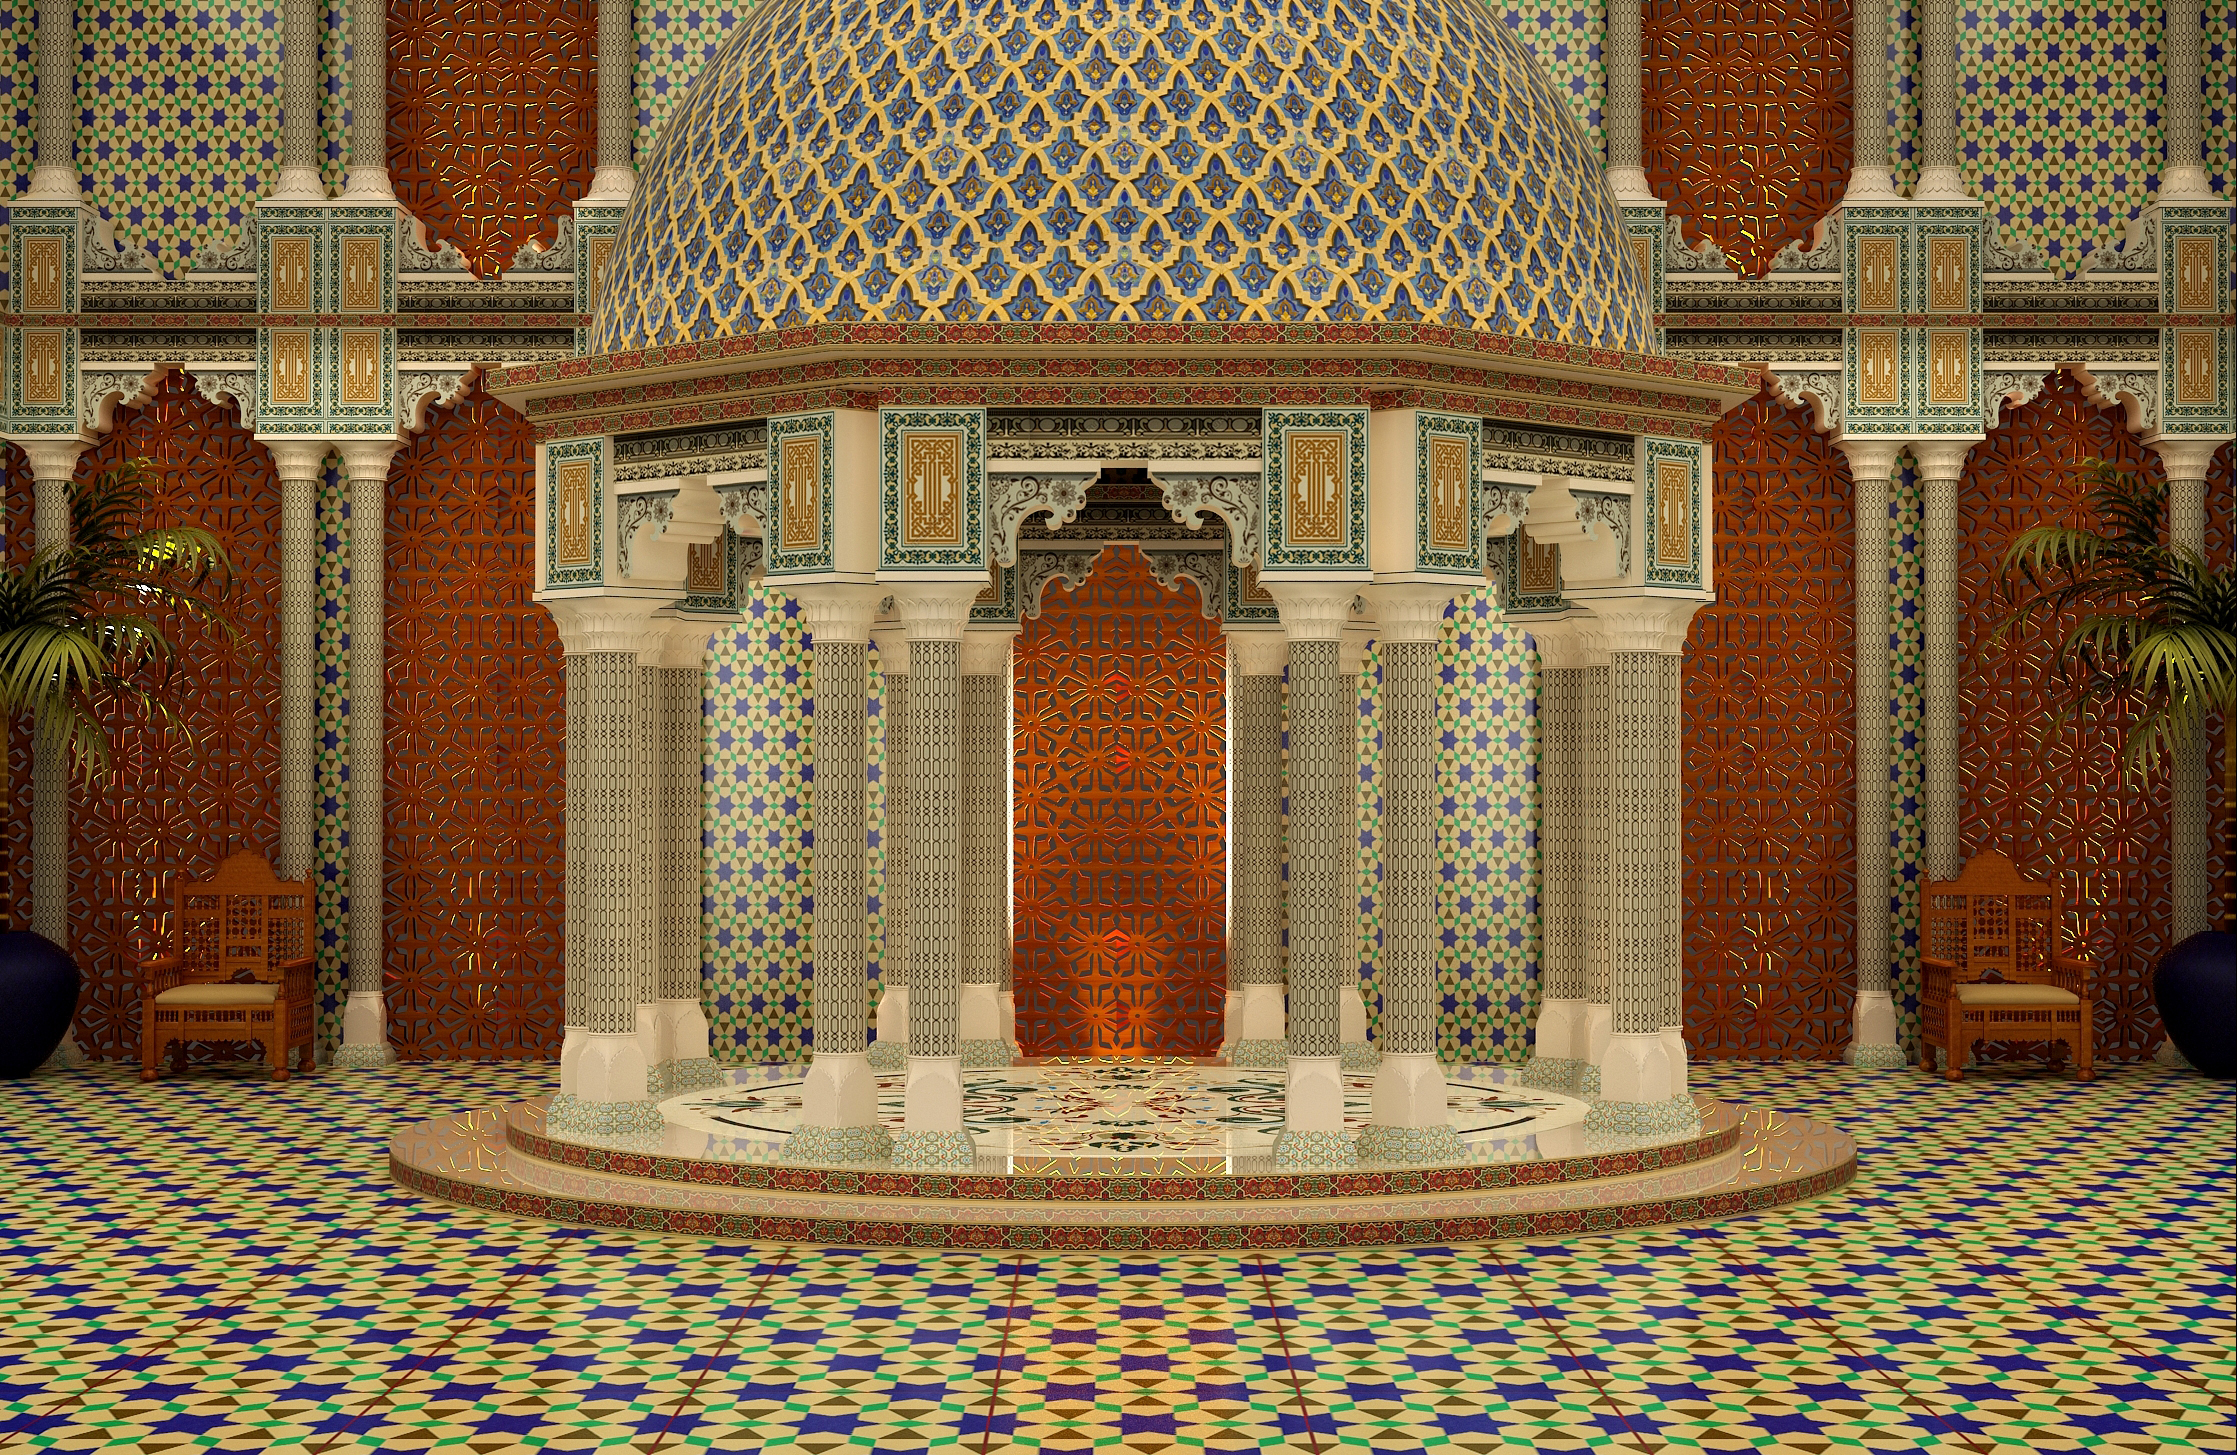 Palace, Morocco